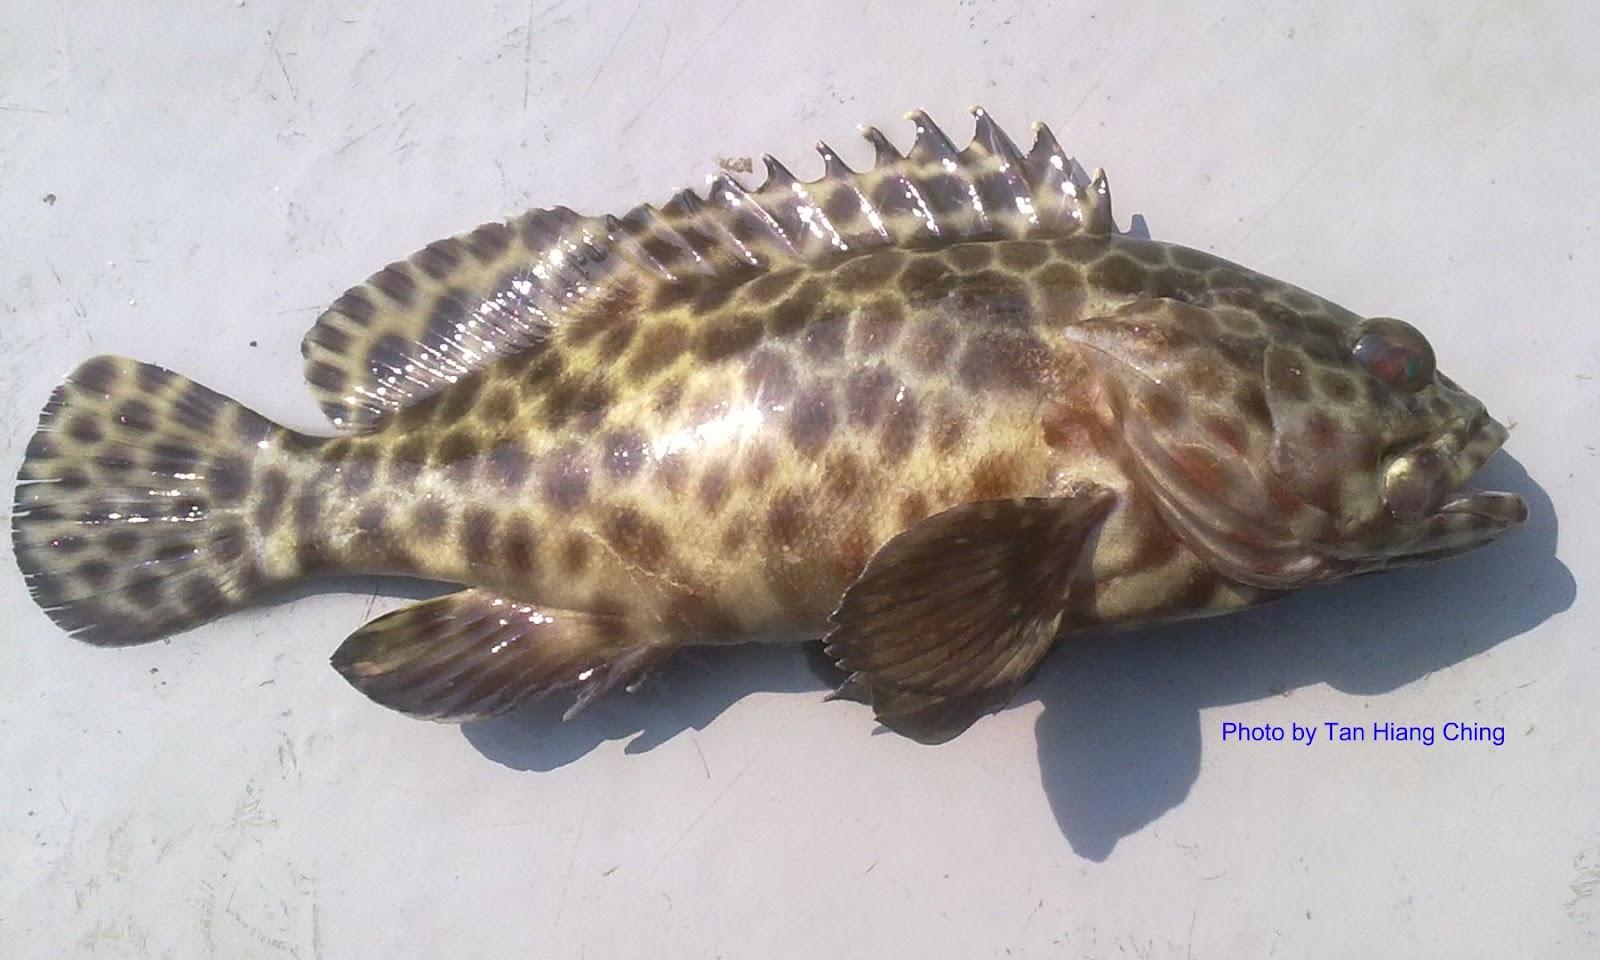 Groupers Talk About Fish Grey Giant Trevally Hitam M Scientific Name Epinephelus Sexfasciatus Valenciennes 1828 English Sixbar Grouper Garoupa Mandarin Sh Bn Y Num